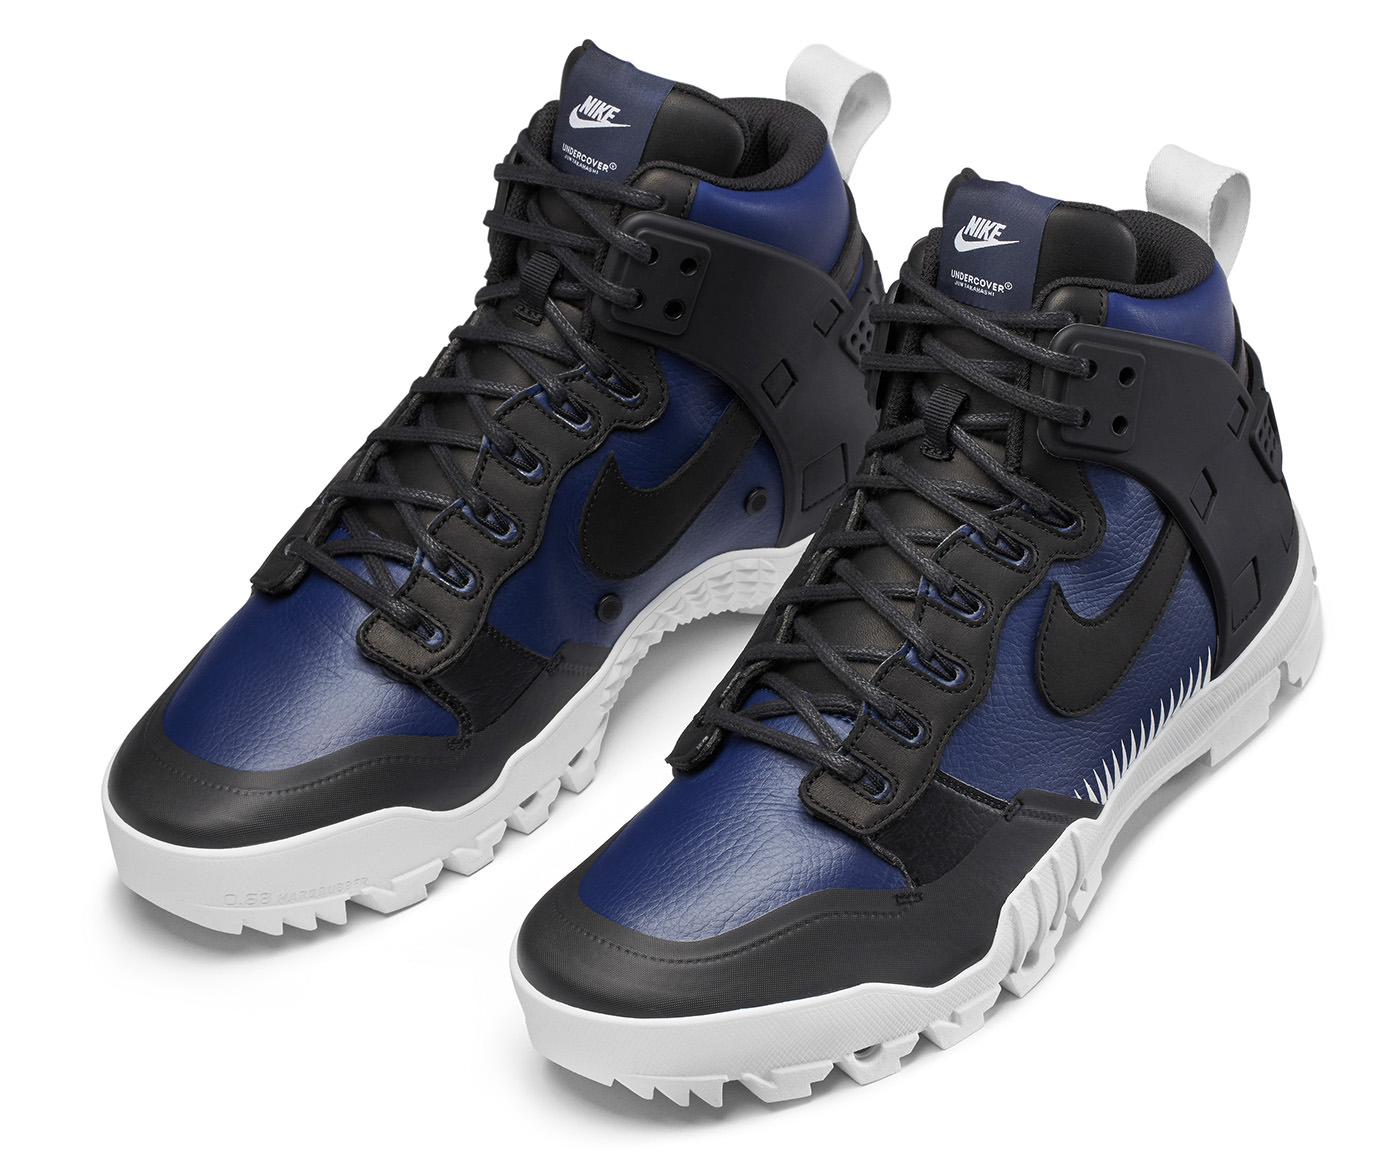 Nike_Lab_JUNGLE_DUNK_910092_001_PAIR_original